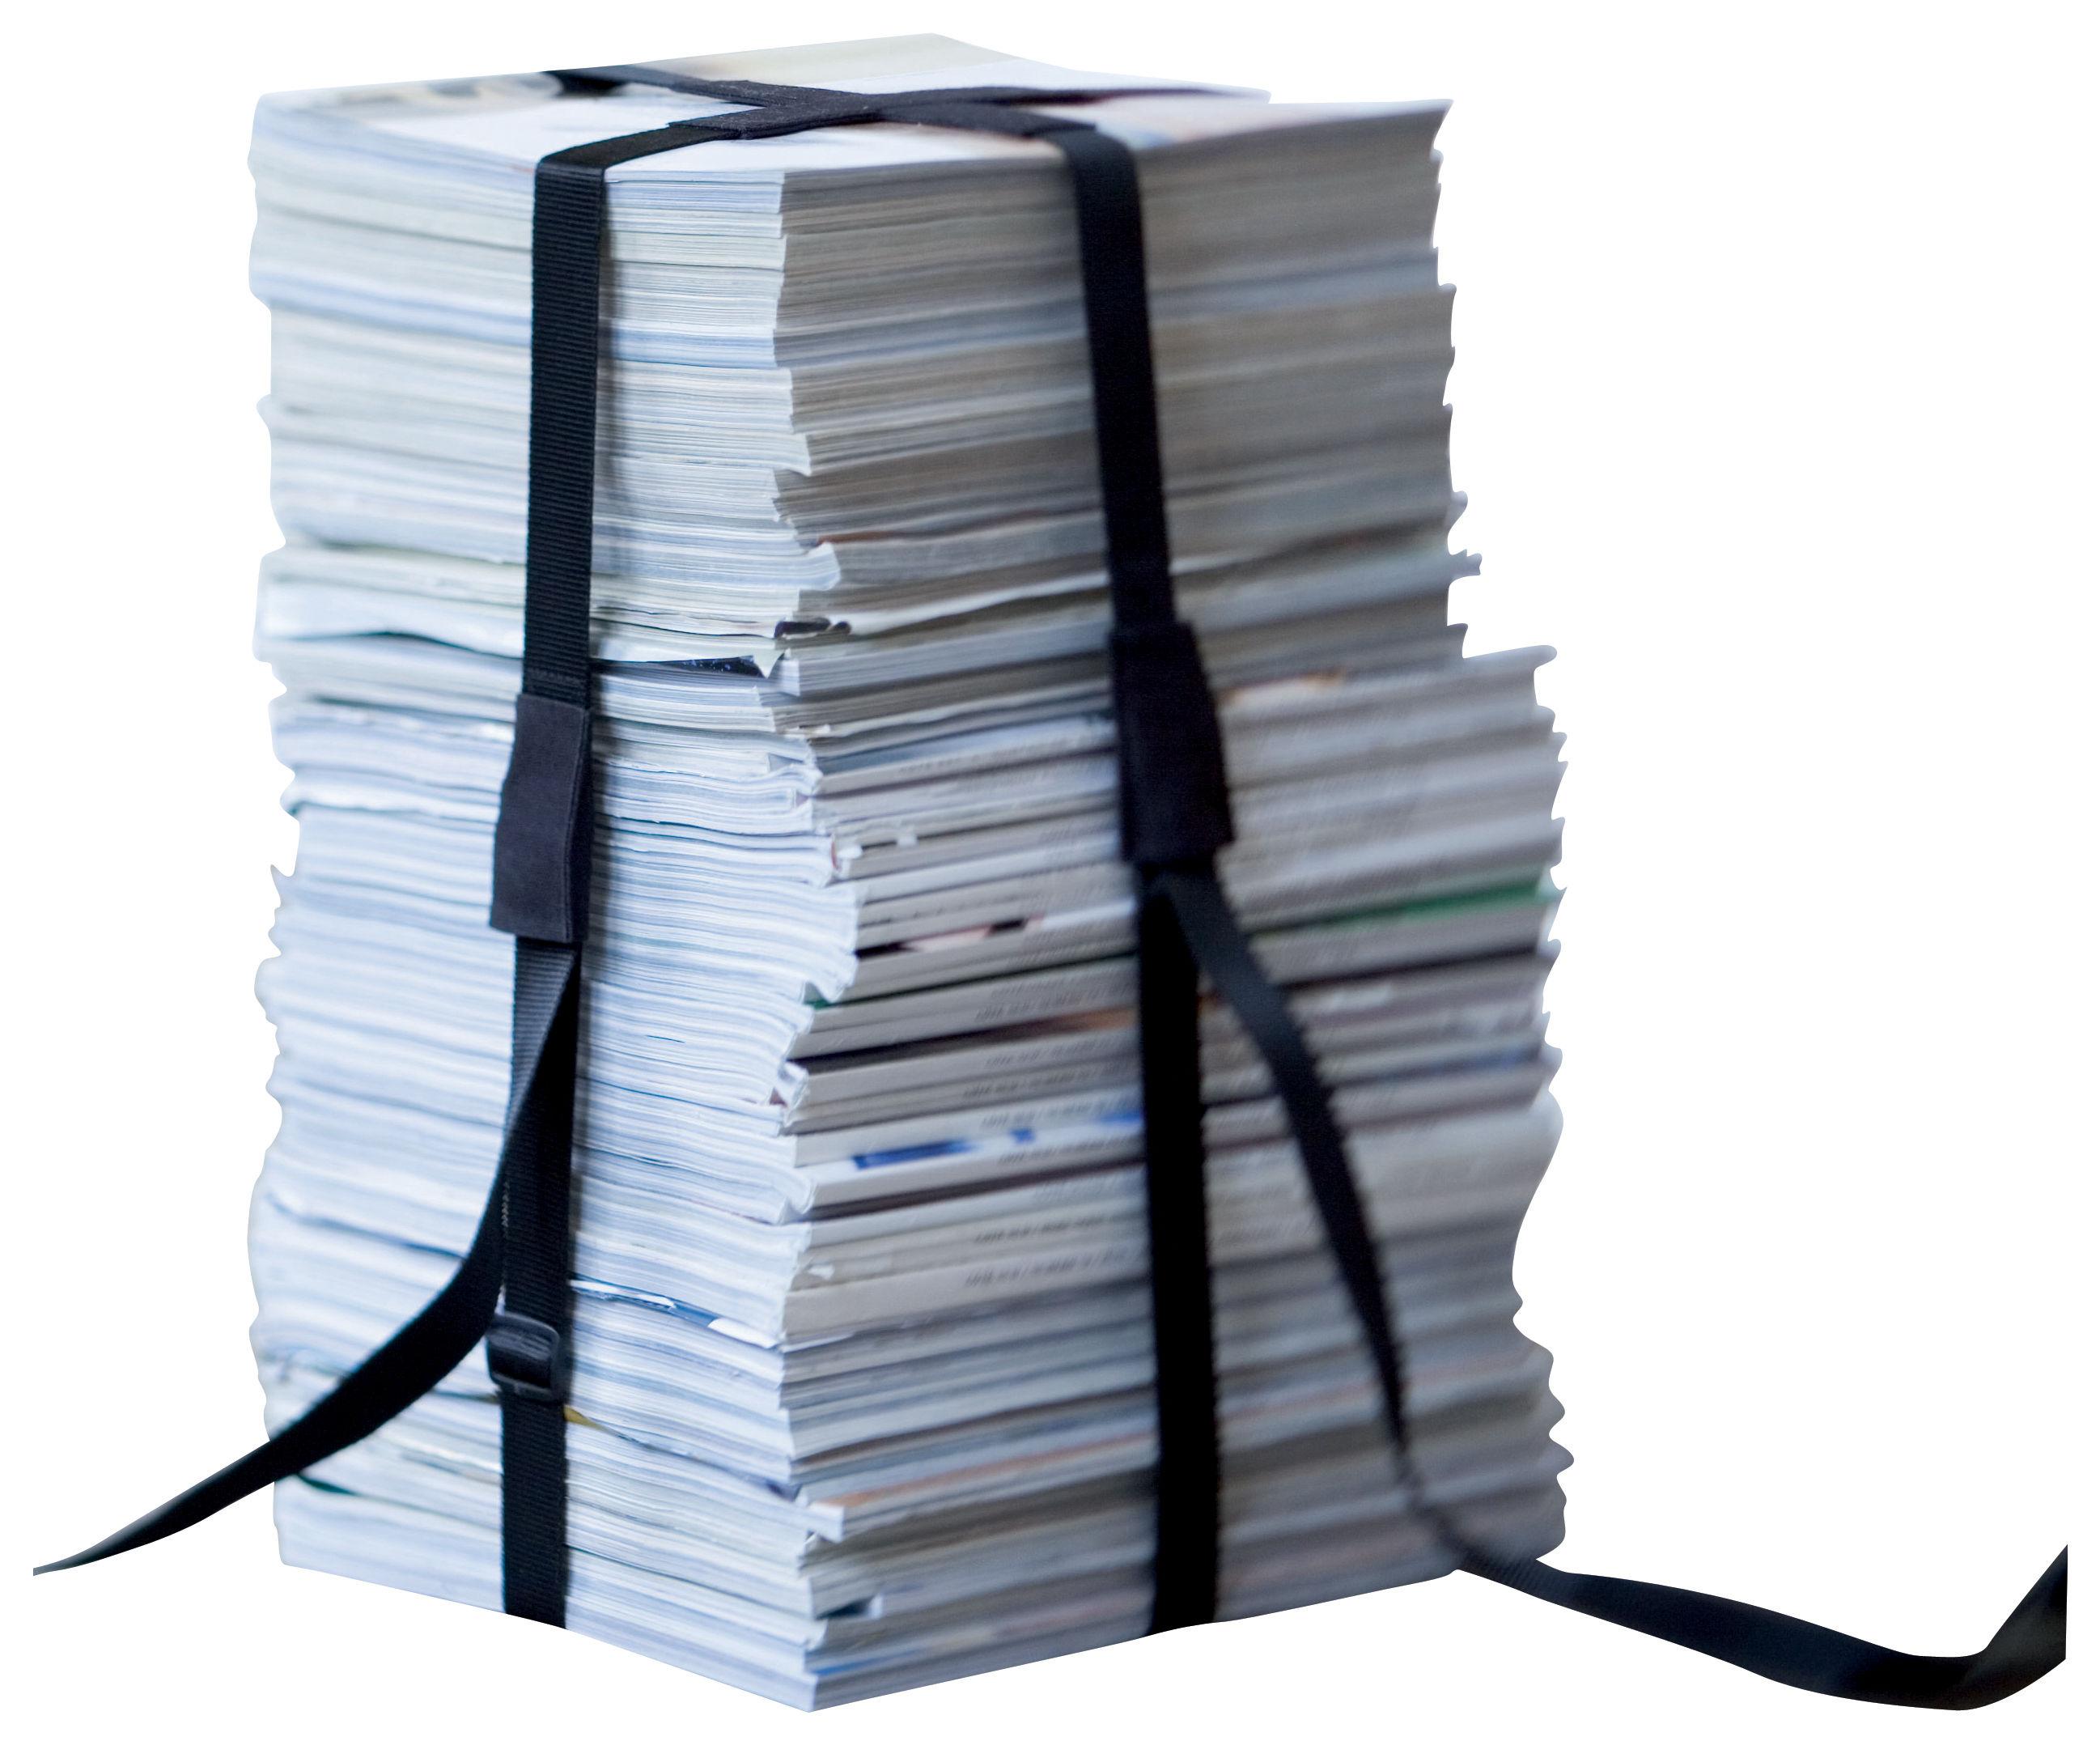 Mobilier - Tabourets bas - Tabouret Book / Sangle en tissu - ENOstudio - Noir - Nylon